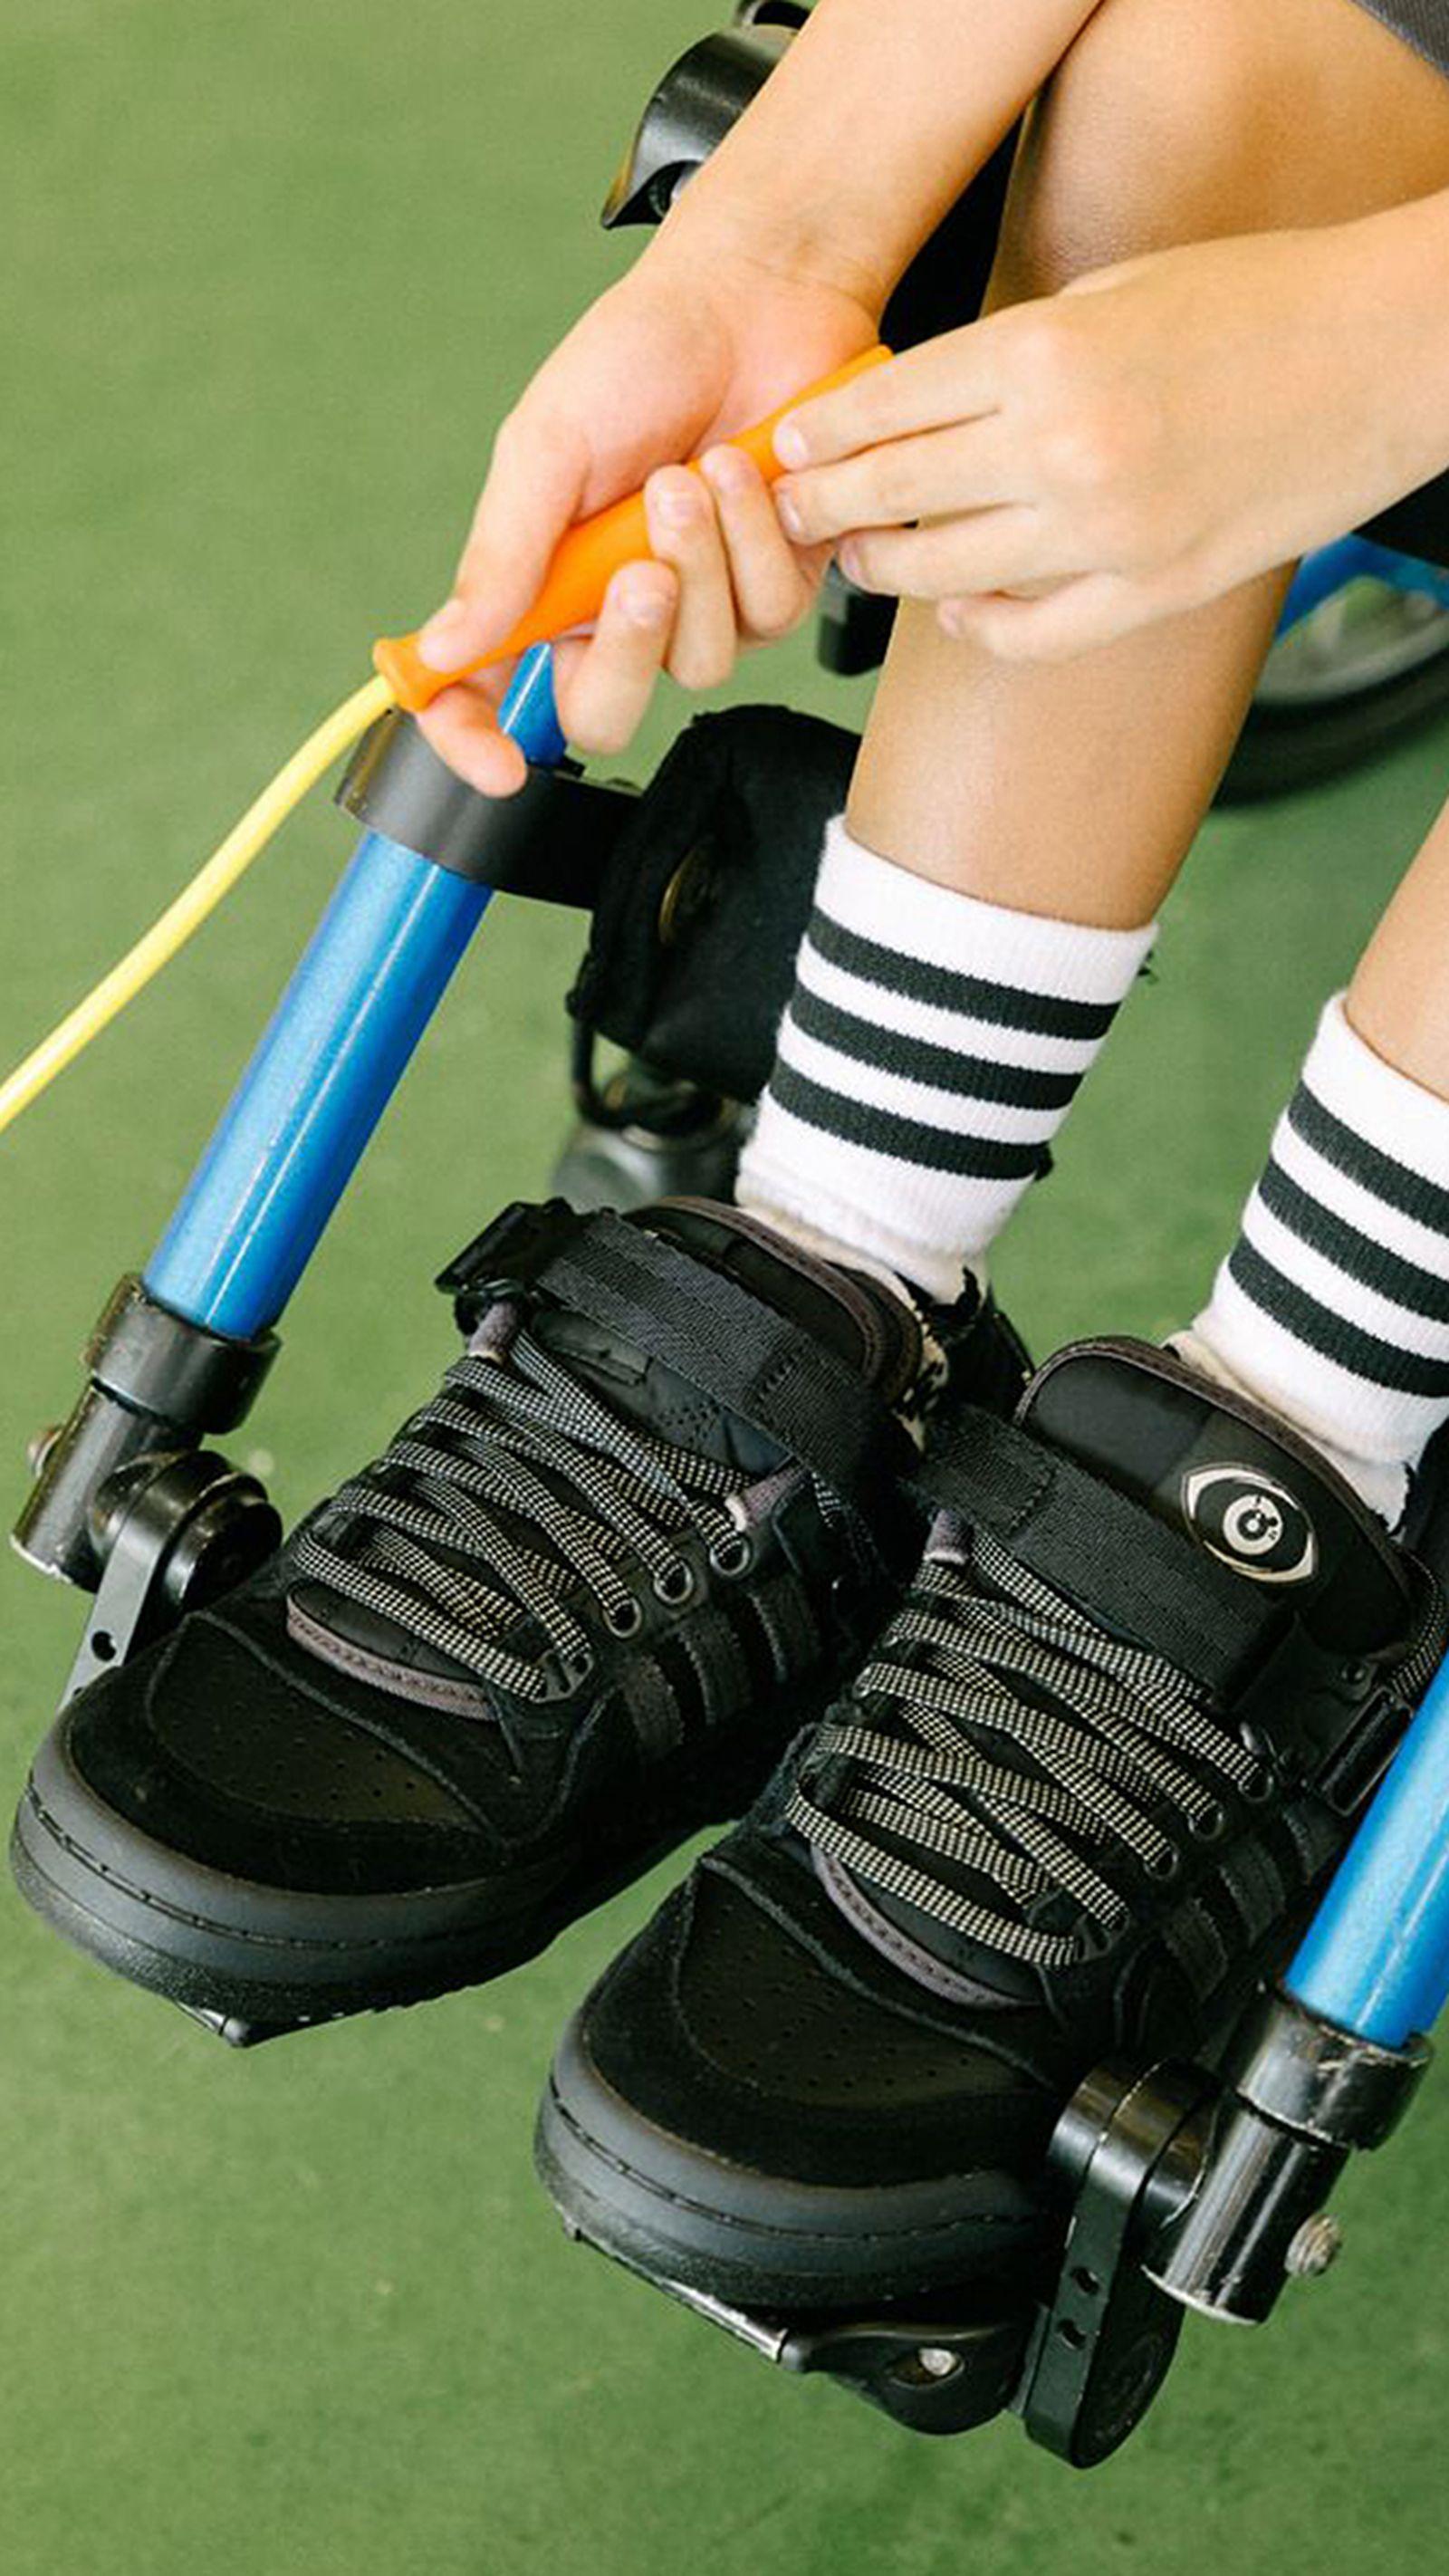 bad-bunny-adidas-originals-forum-low-triple-black-release-date-price-06